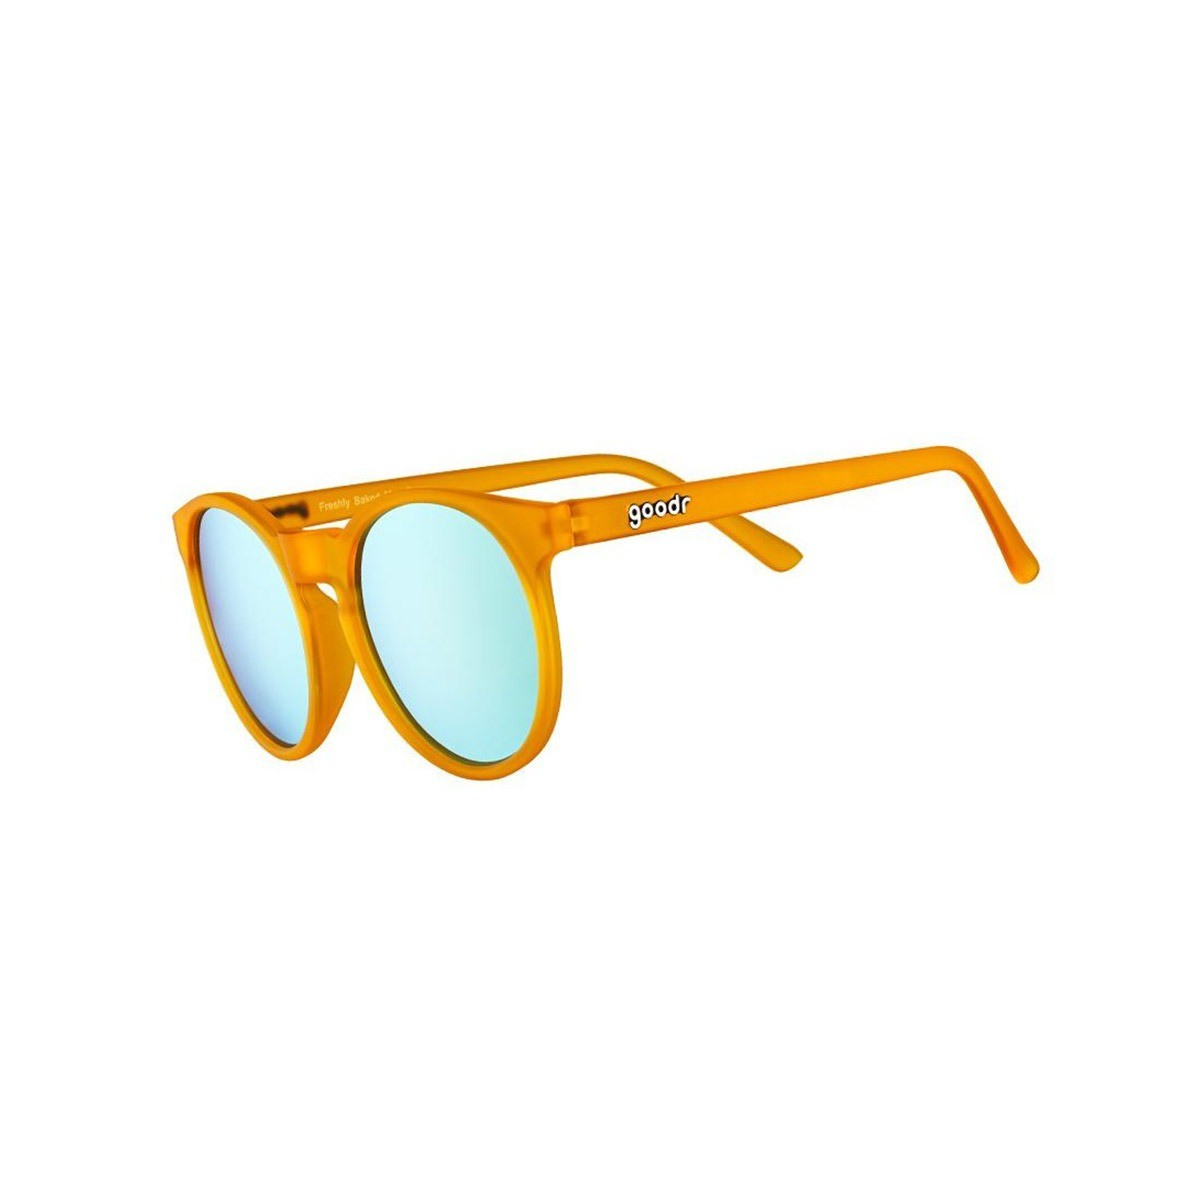 Oculos de Sol Goodr - Freshly Baked Man Buns